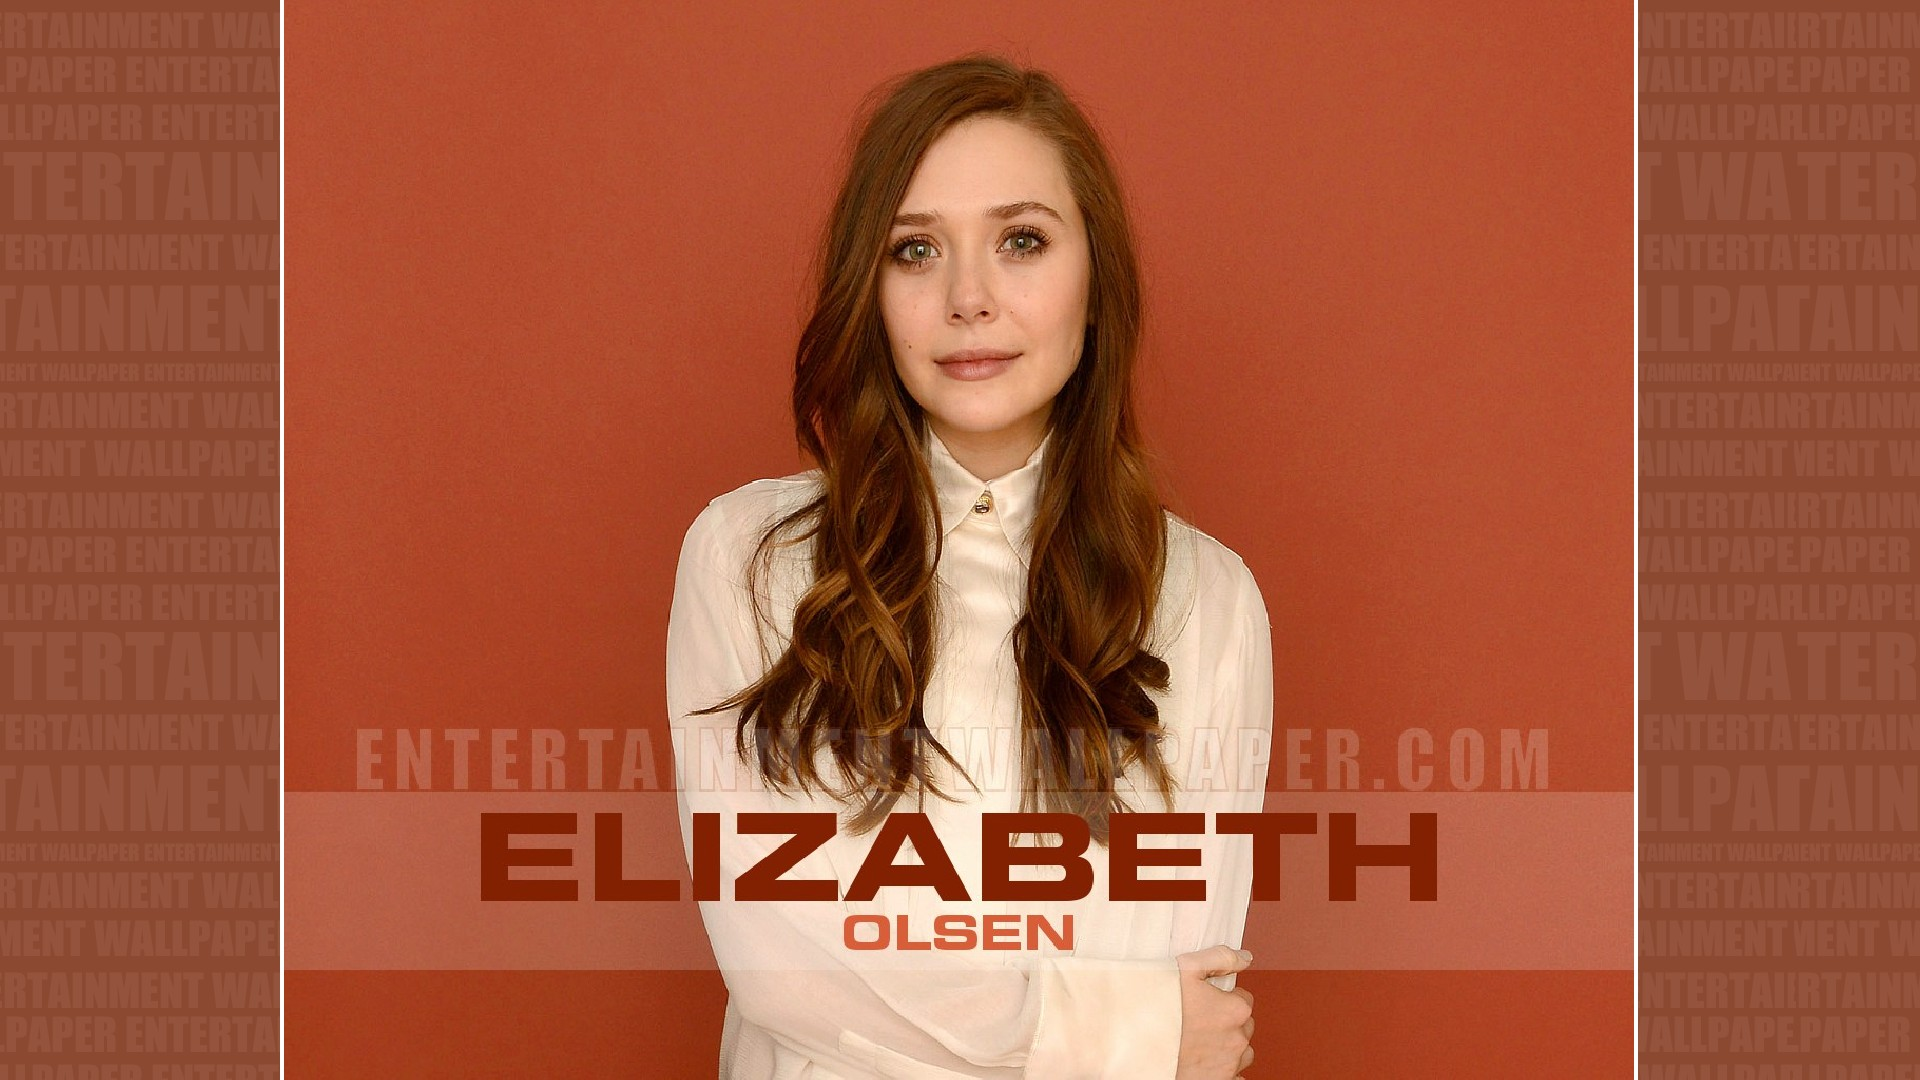 Elizabeth Olsen Wallpaper - Elizabeth Olsen Wallpaper Pc , HD Wallpaper & Backgrounds